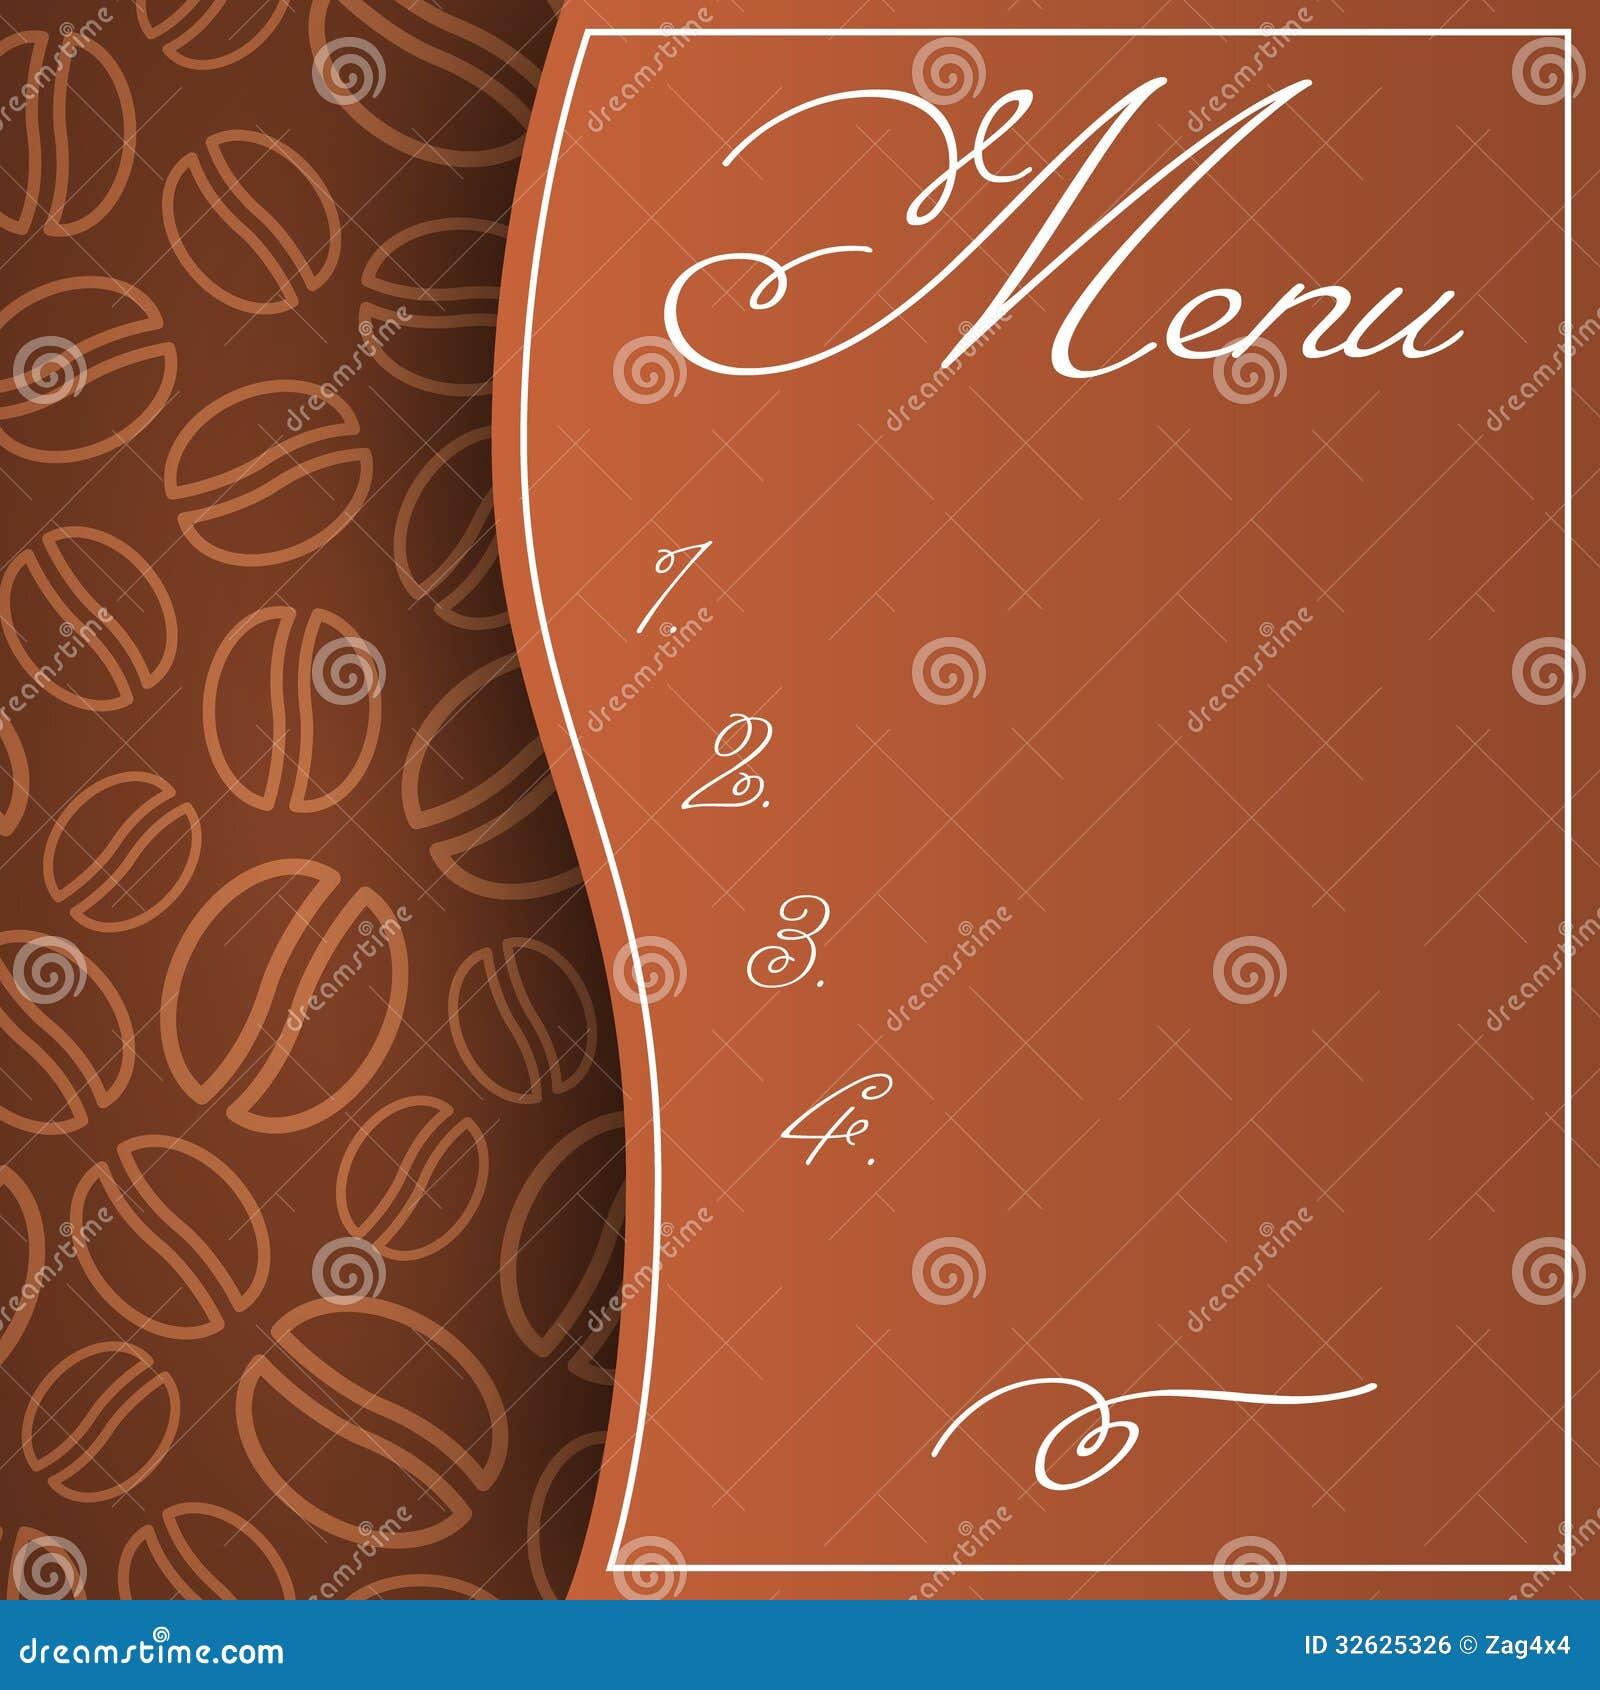 Cafe Menu Royalty Free Stock Image Image 32625326